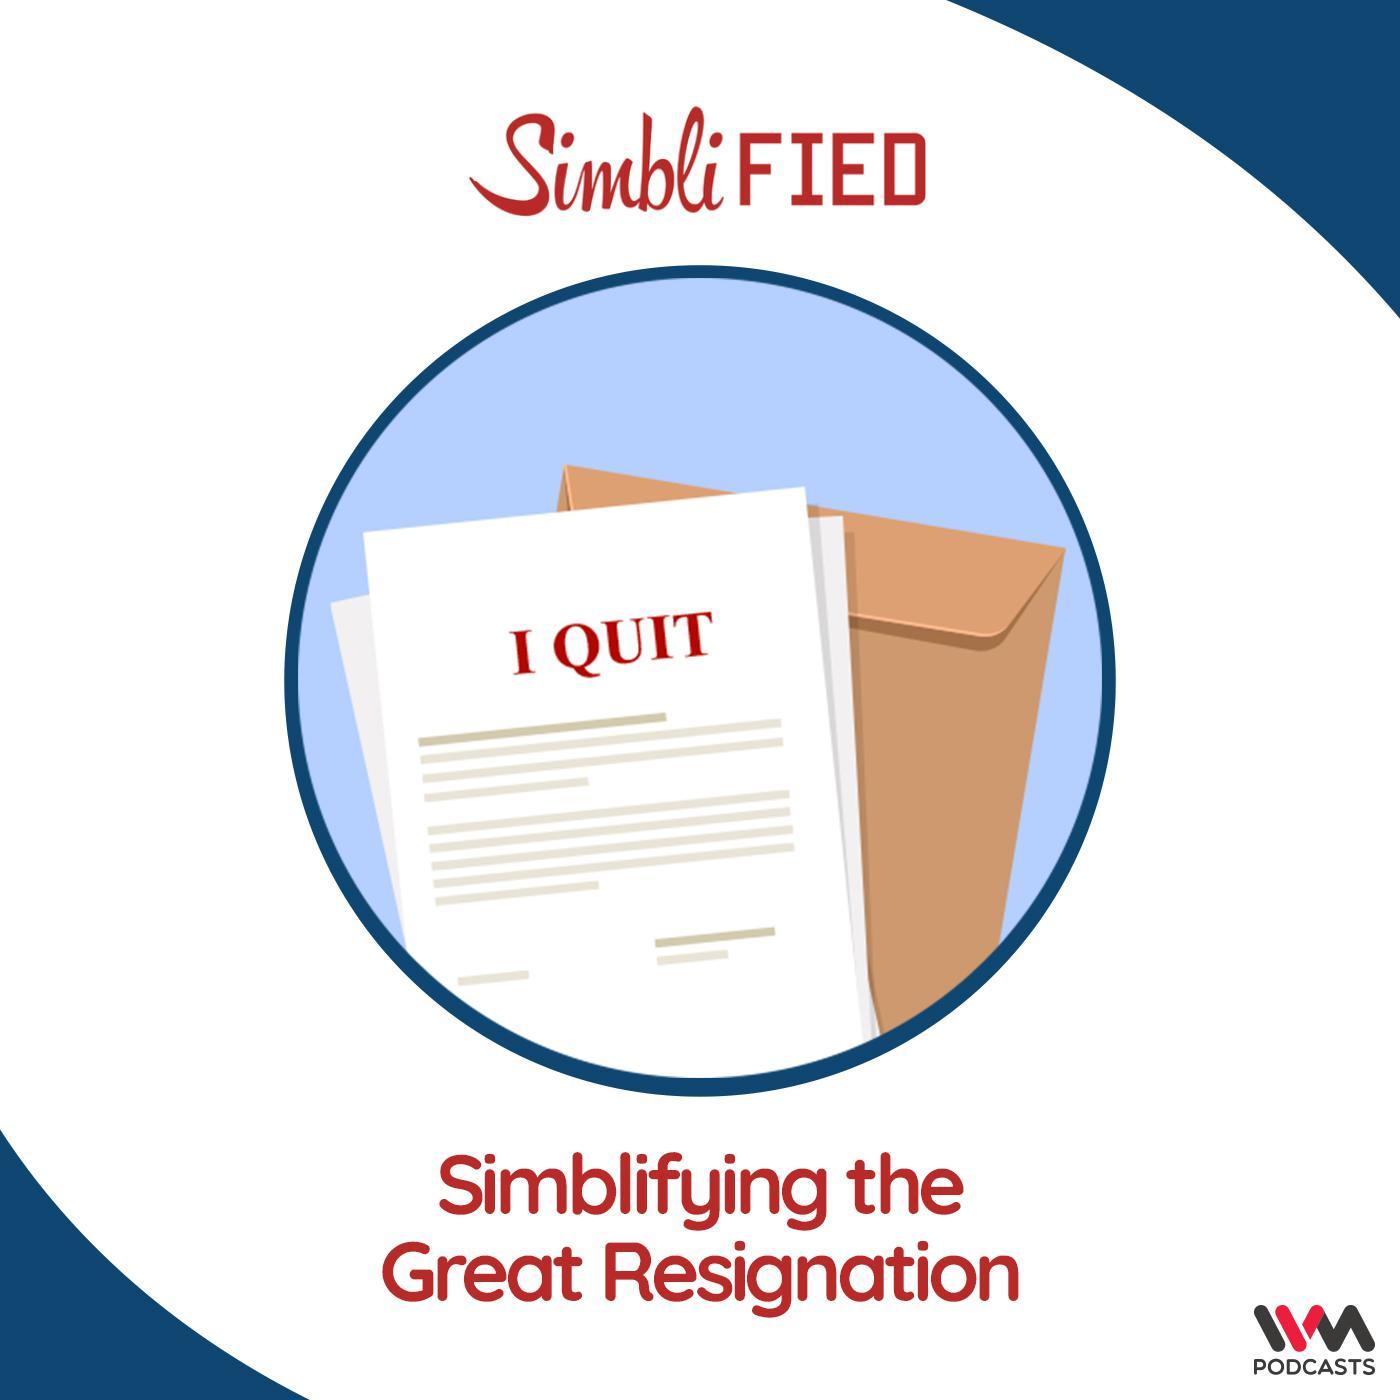 Simblifying the Great Resignation